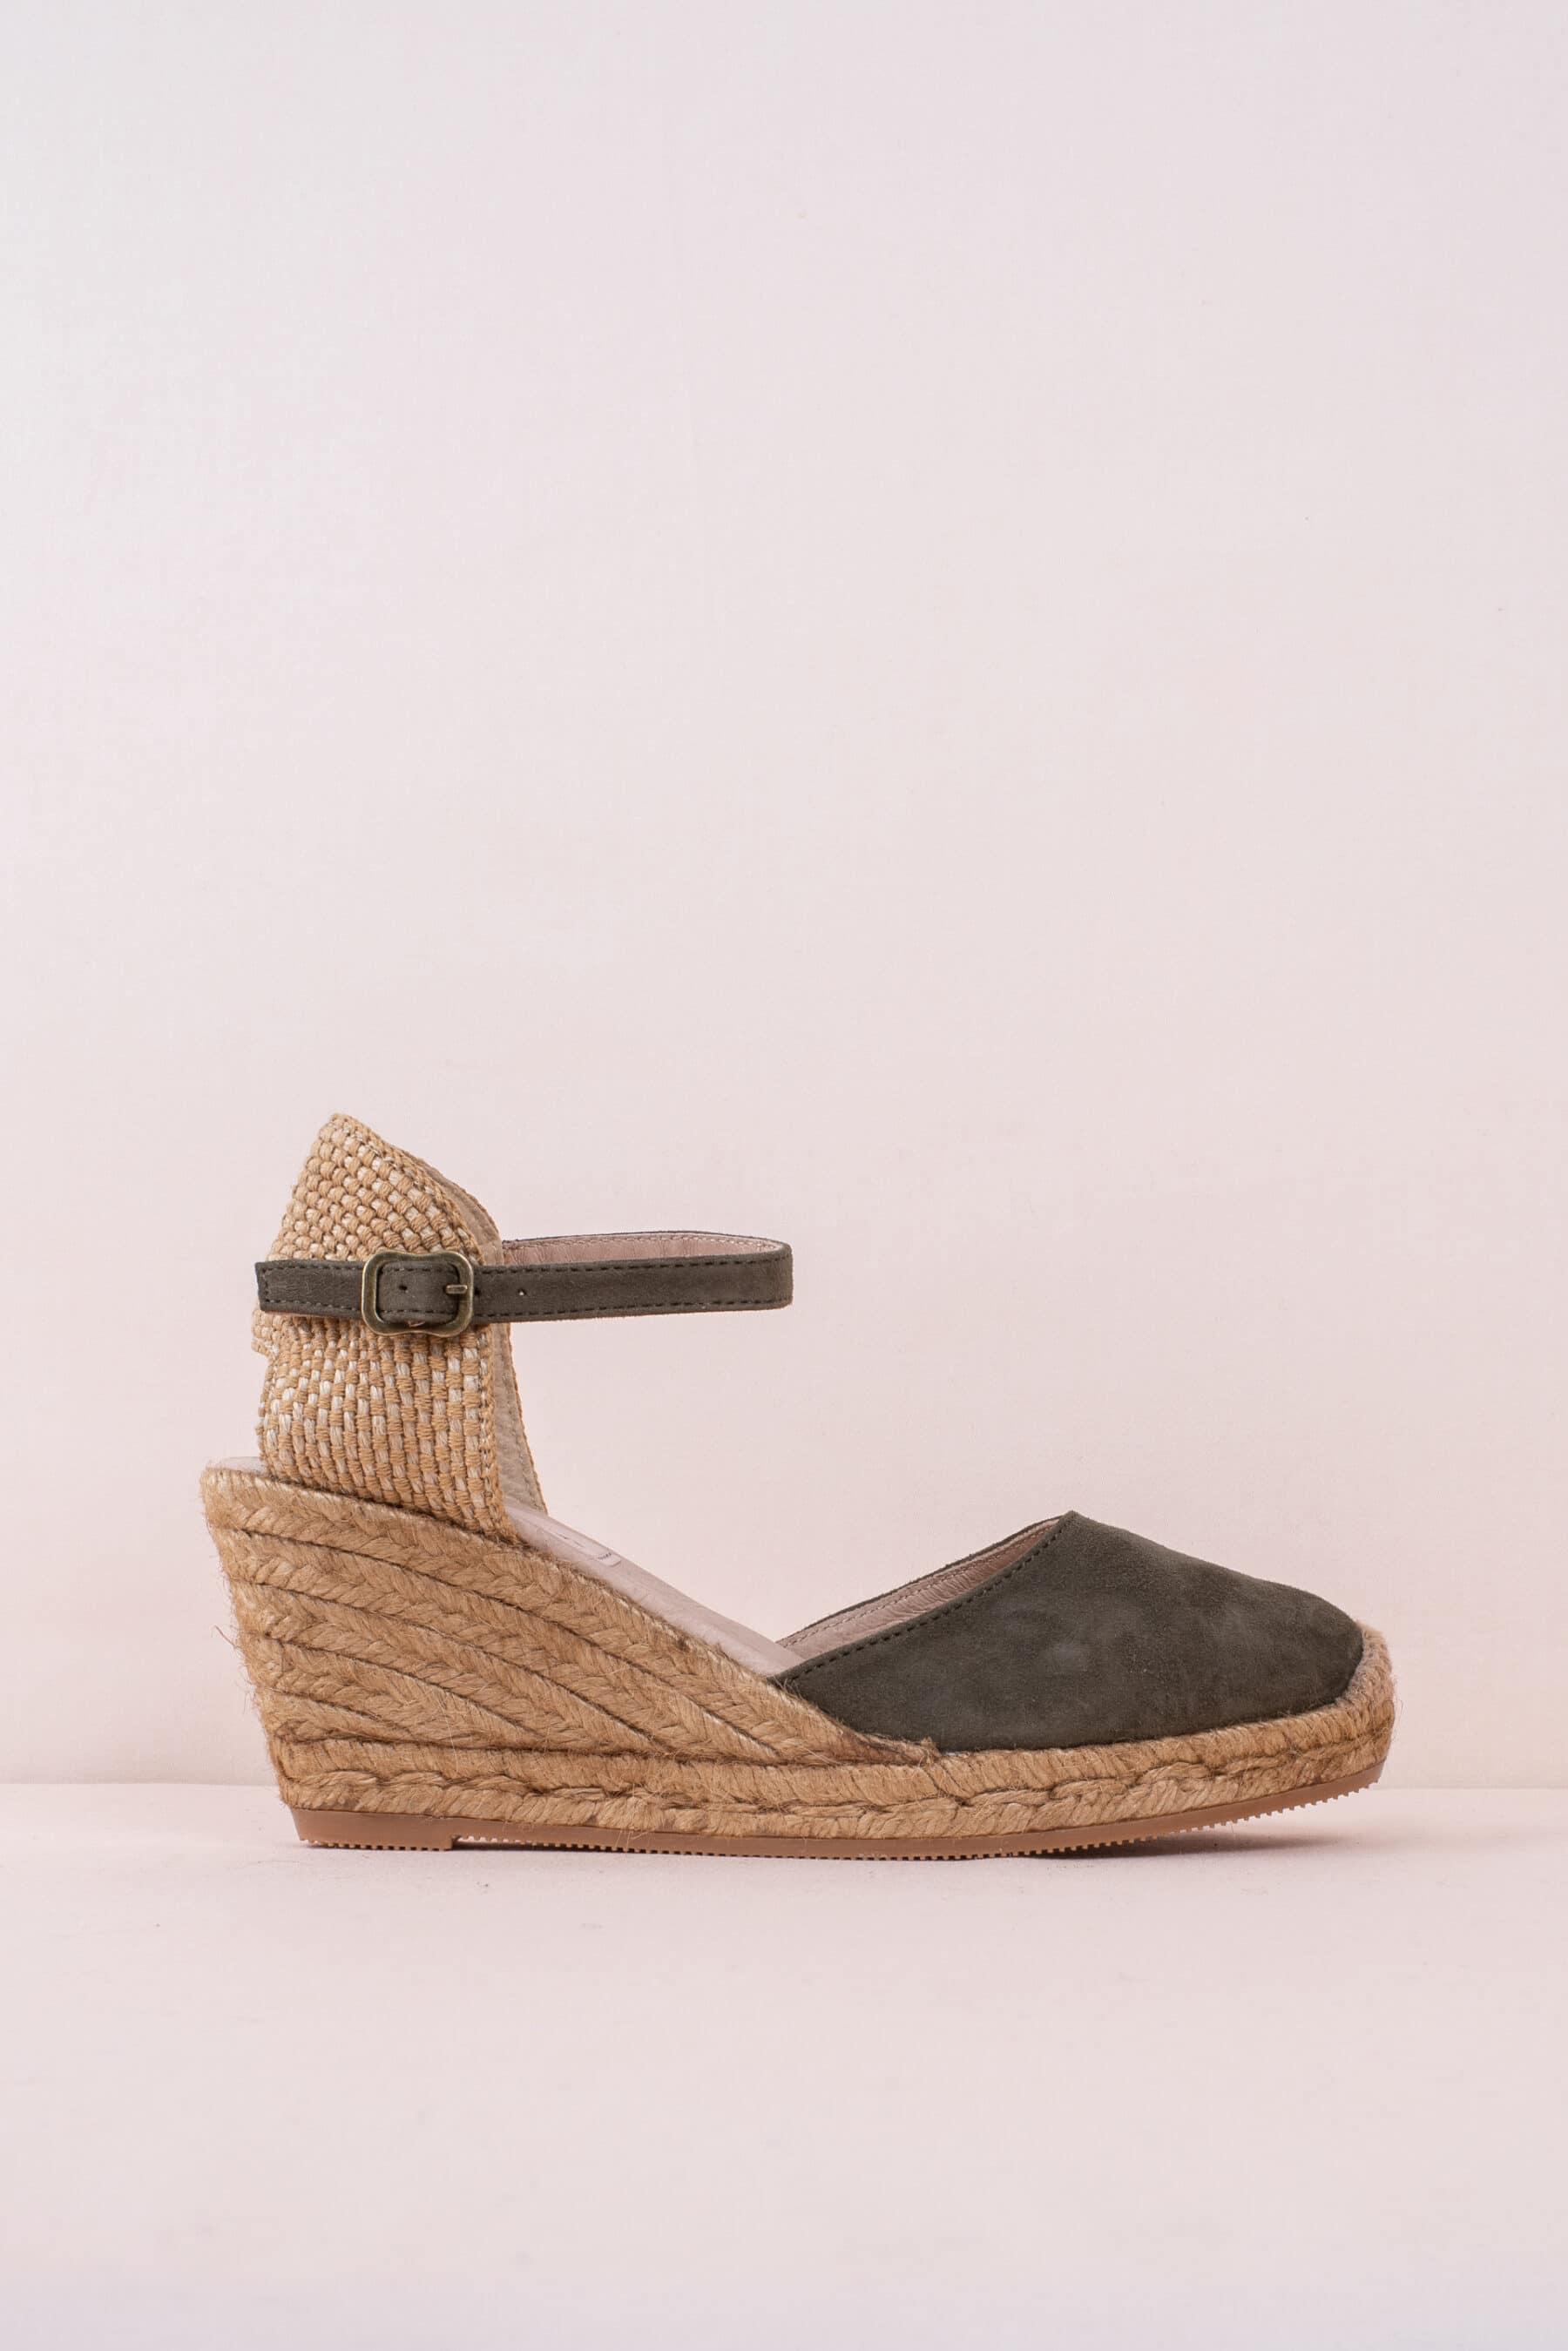 Obi Cactus Alpargatas en Loyna Shoes